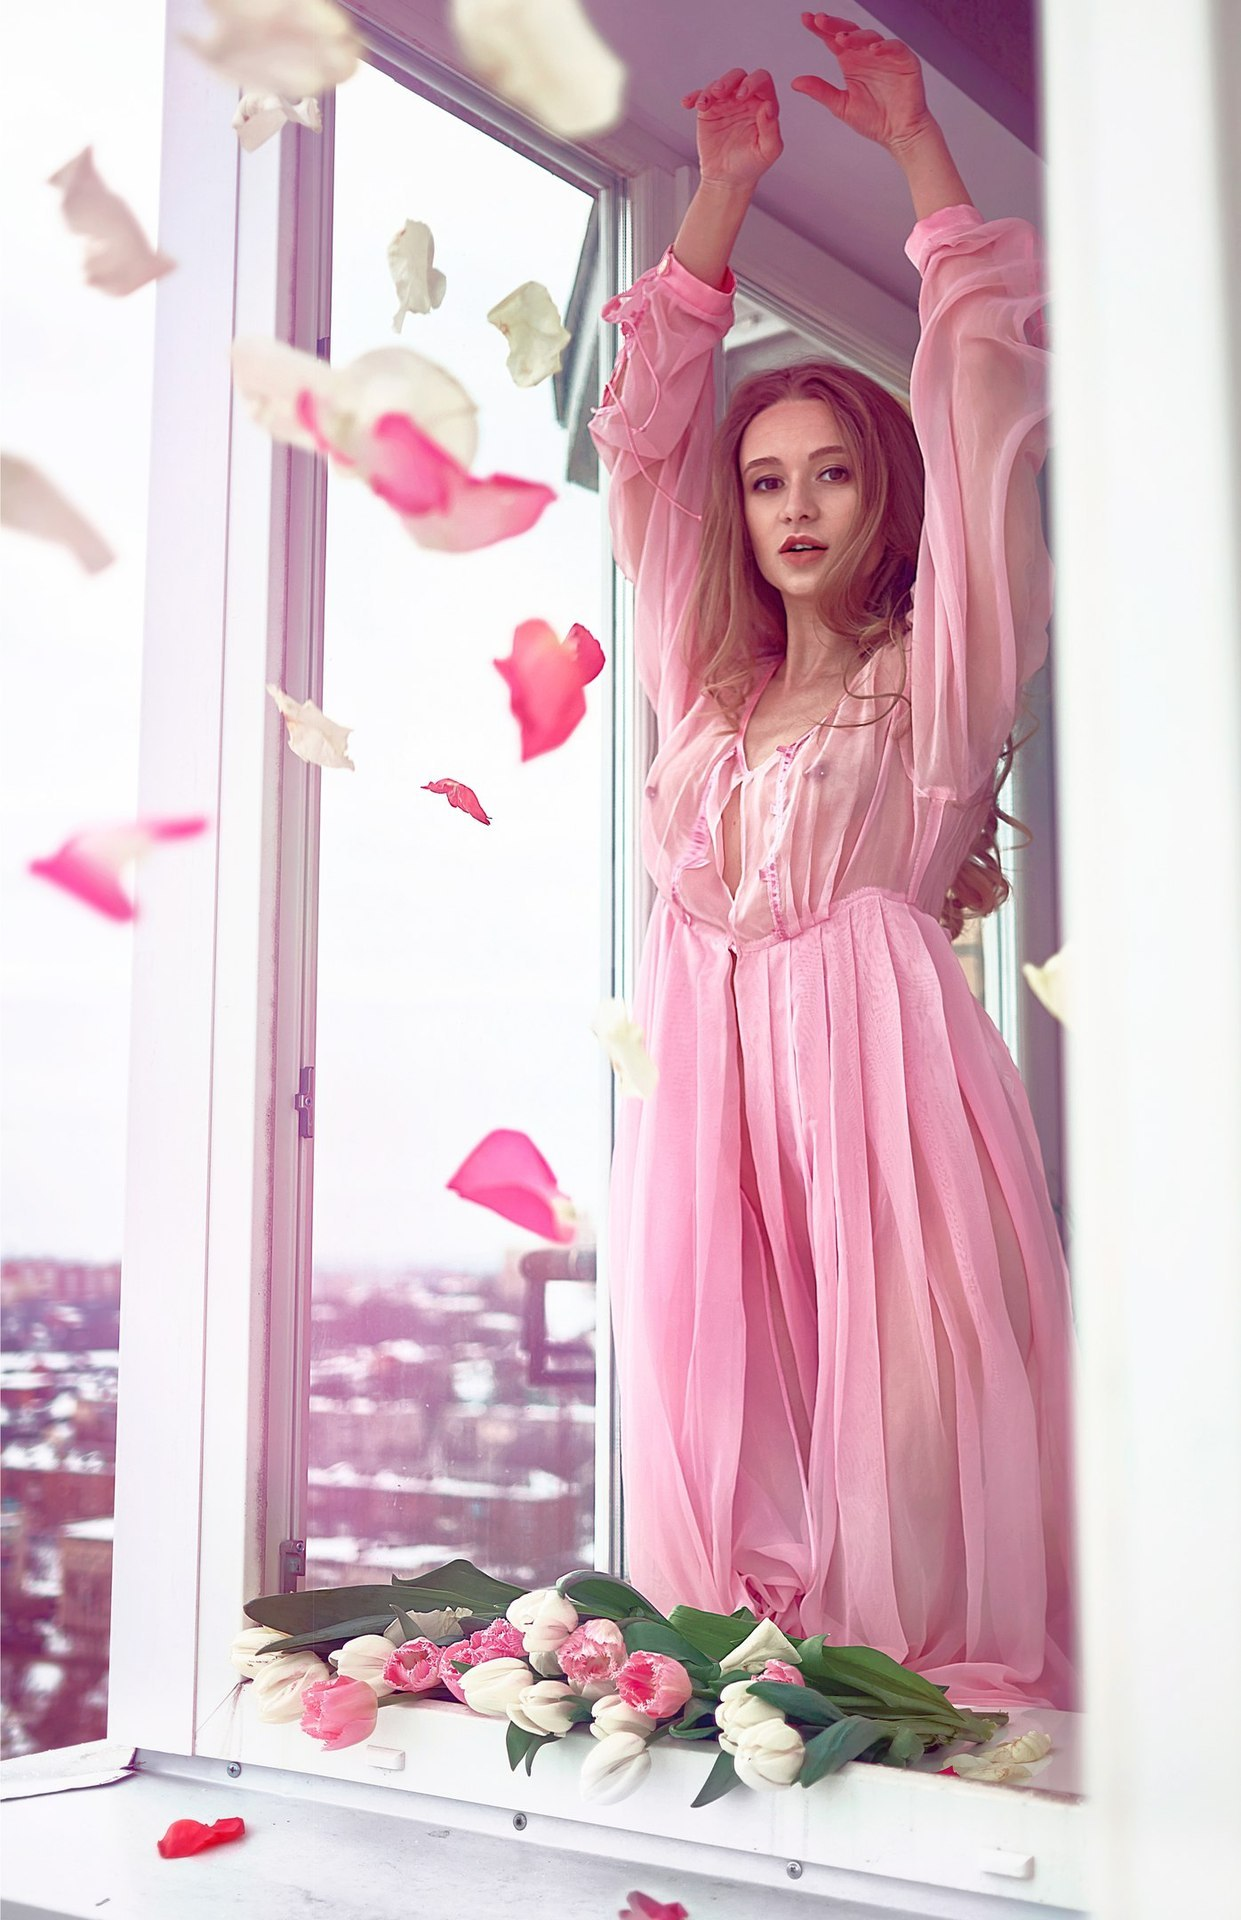 Anastasia Abramova